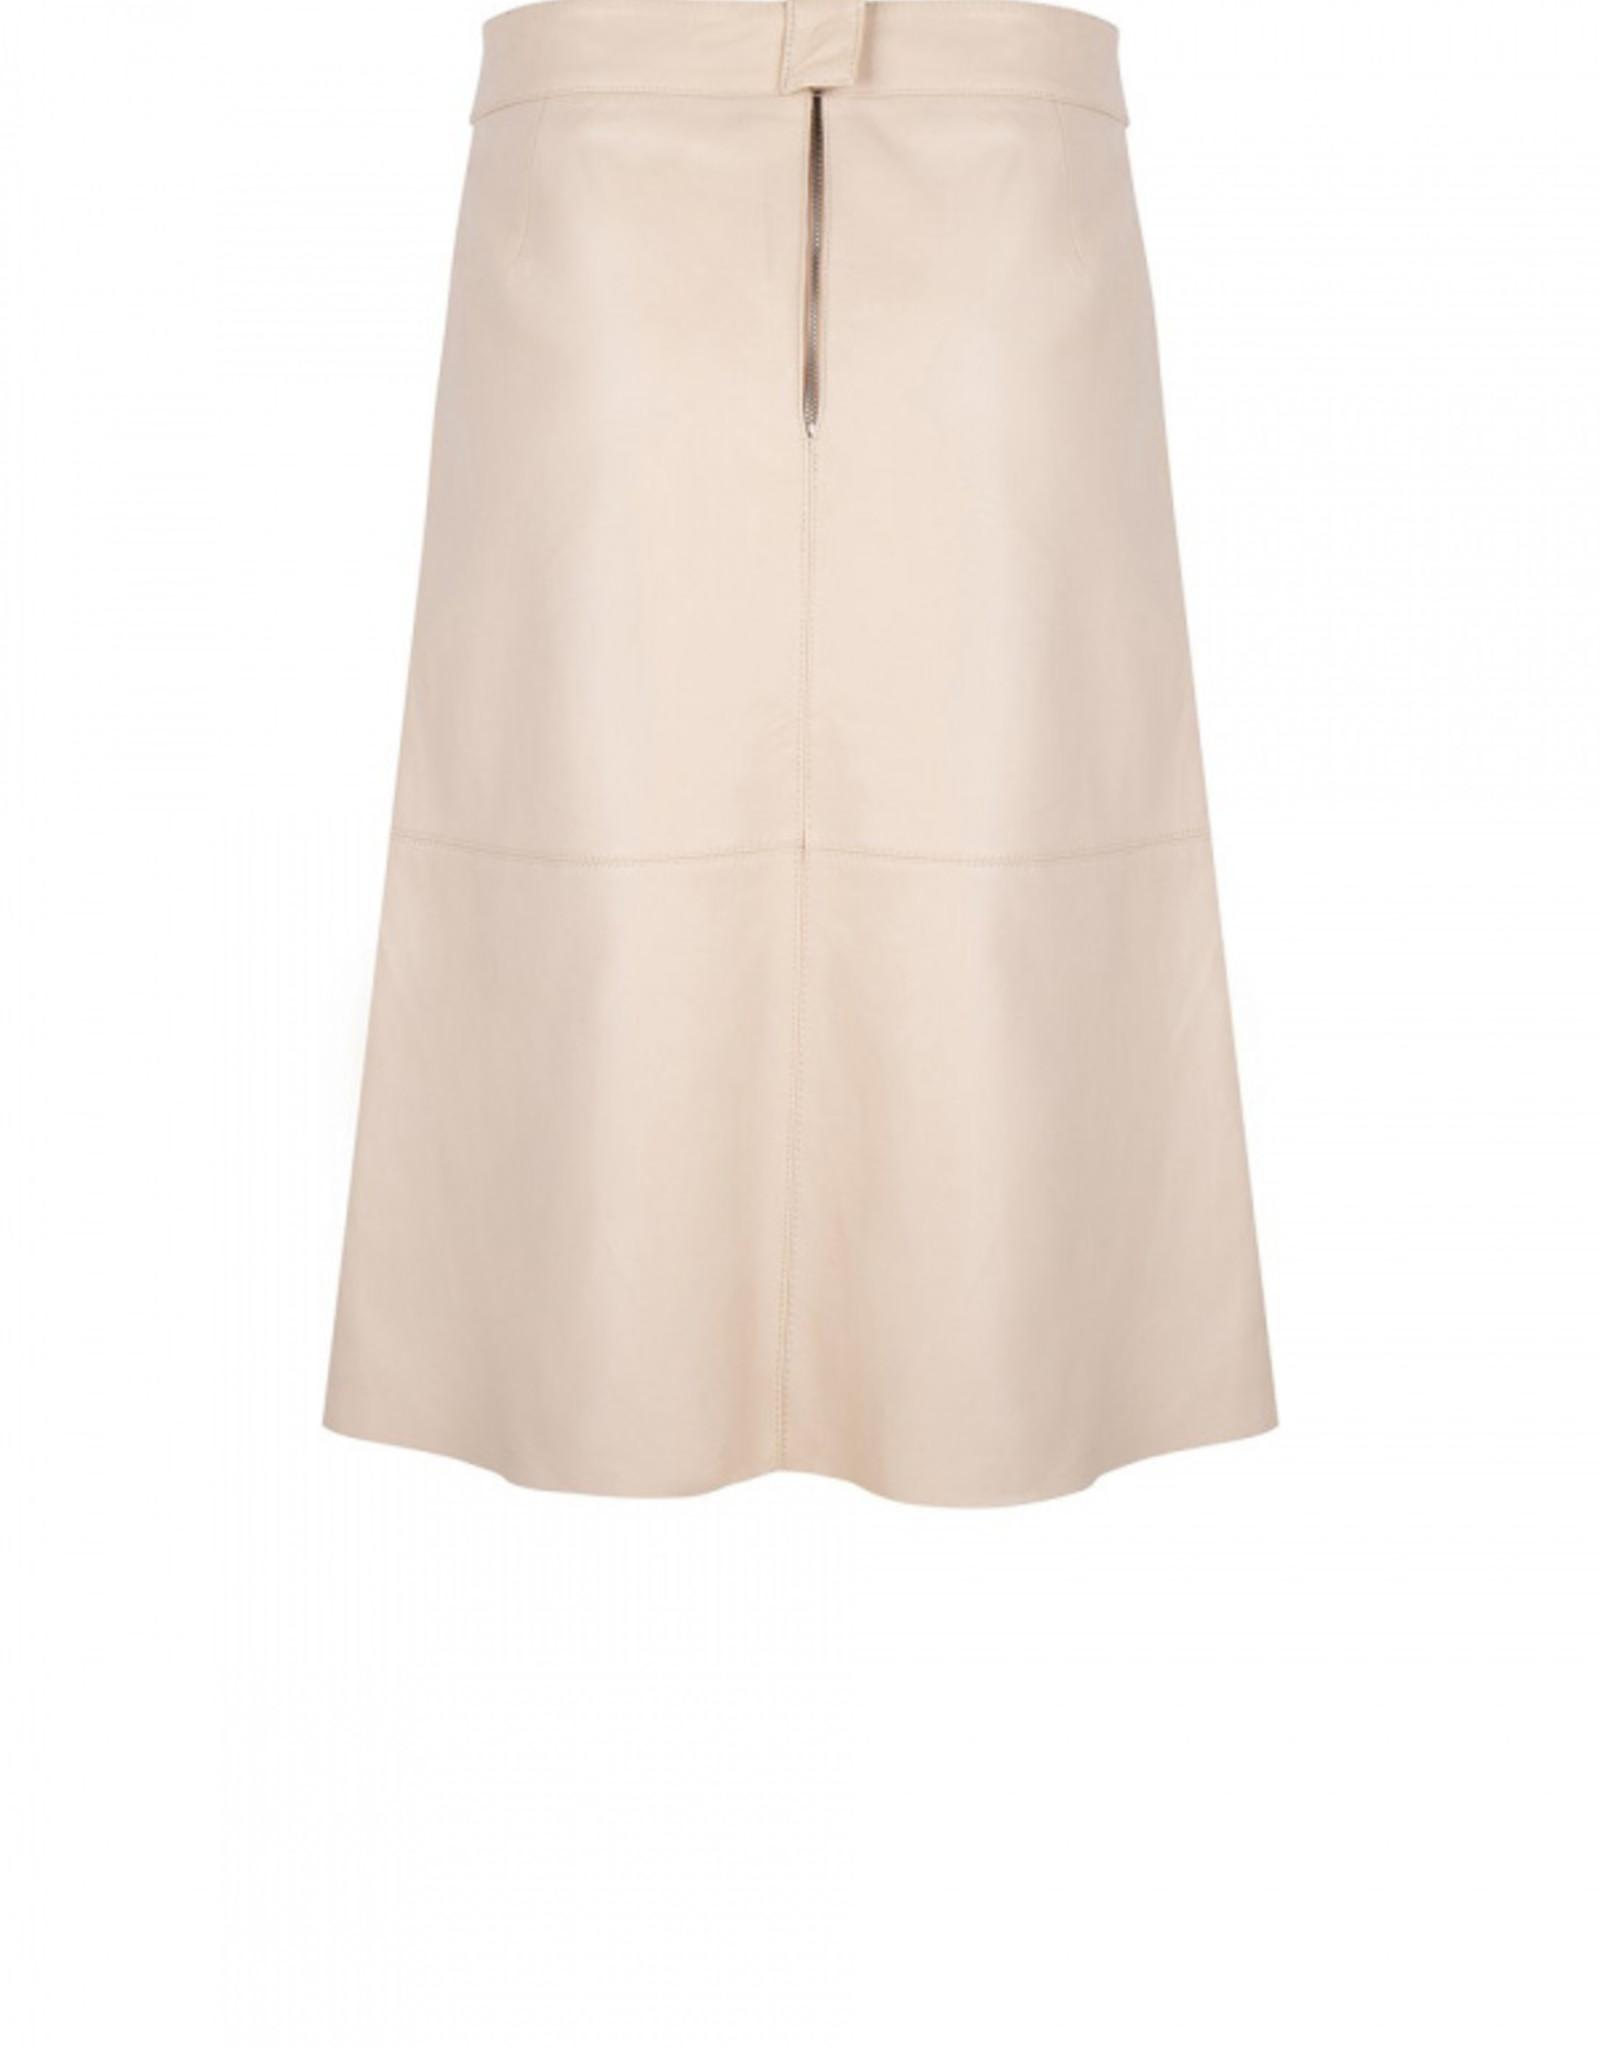 Dante6 Pulson leather skirt